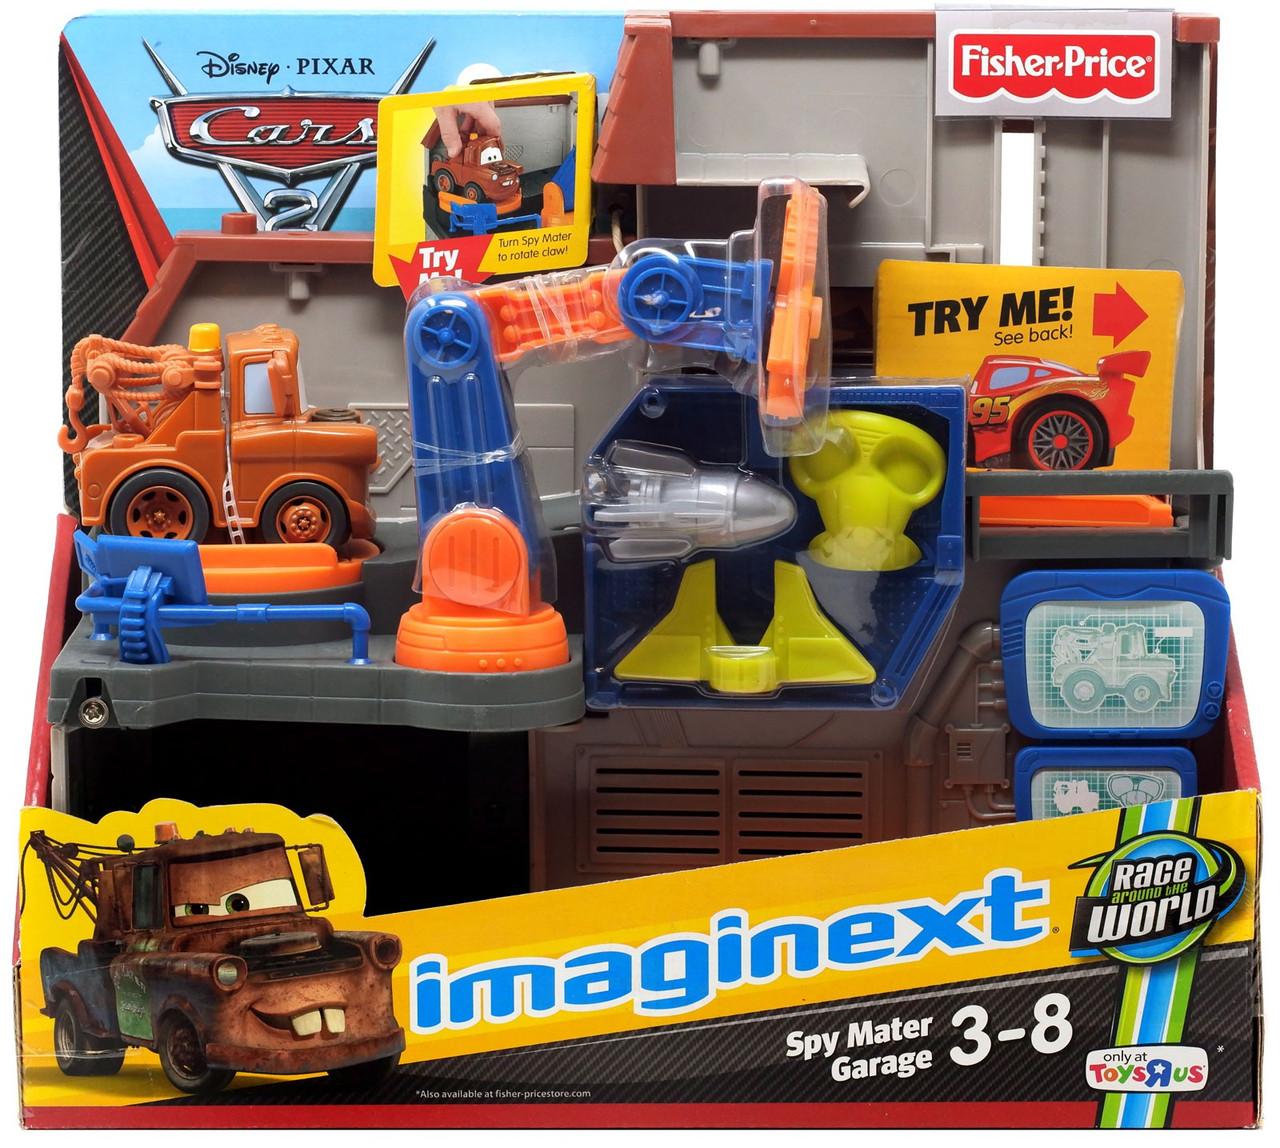 Fisher Price Disney Pixar Cars Cars 2 Imaginext Spy Mater Garage